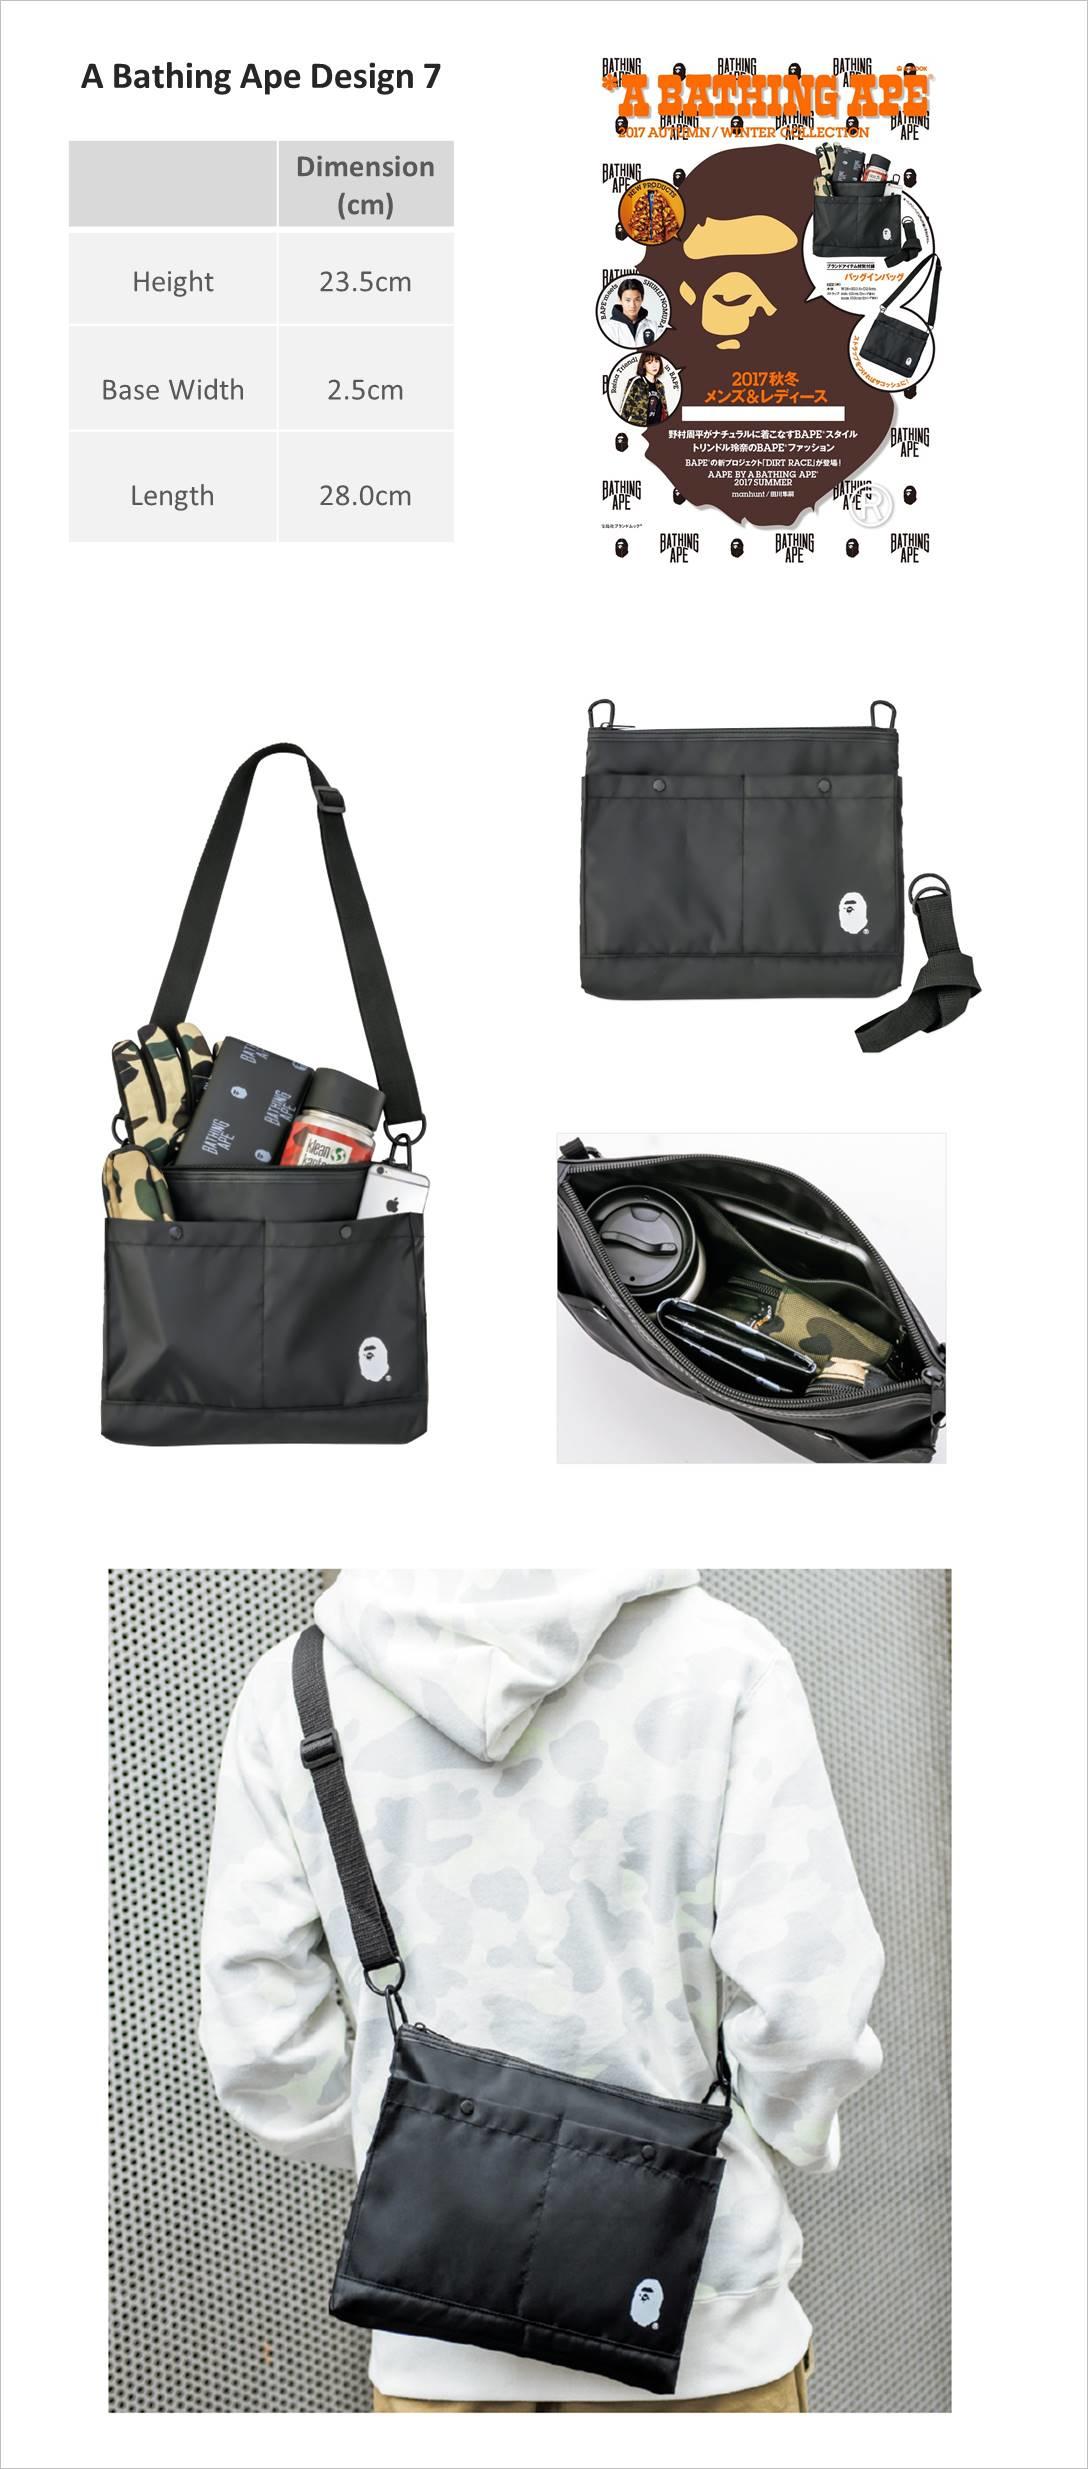 50305de748c2 To purchase Jill Stuart - Pouch Series 2 Design 6. Please access the  following link  https   www.qoo10.sg g 418844446